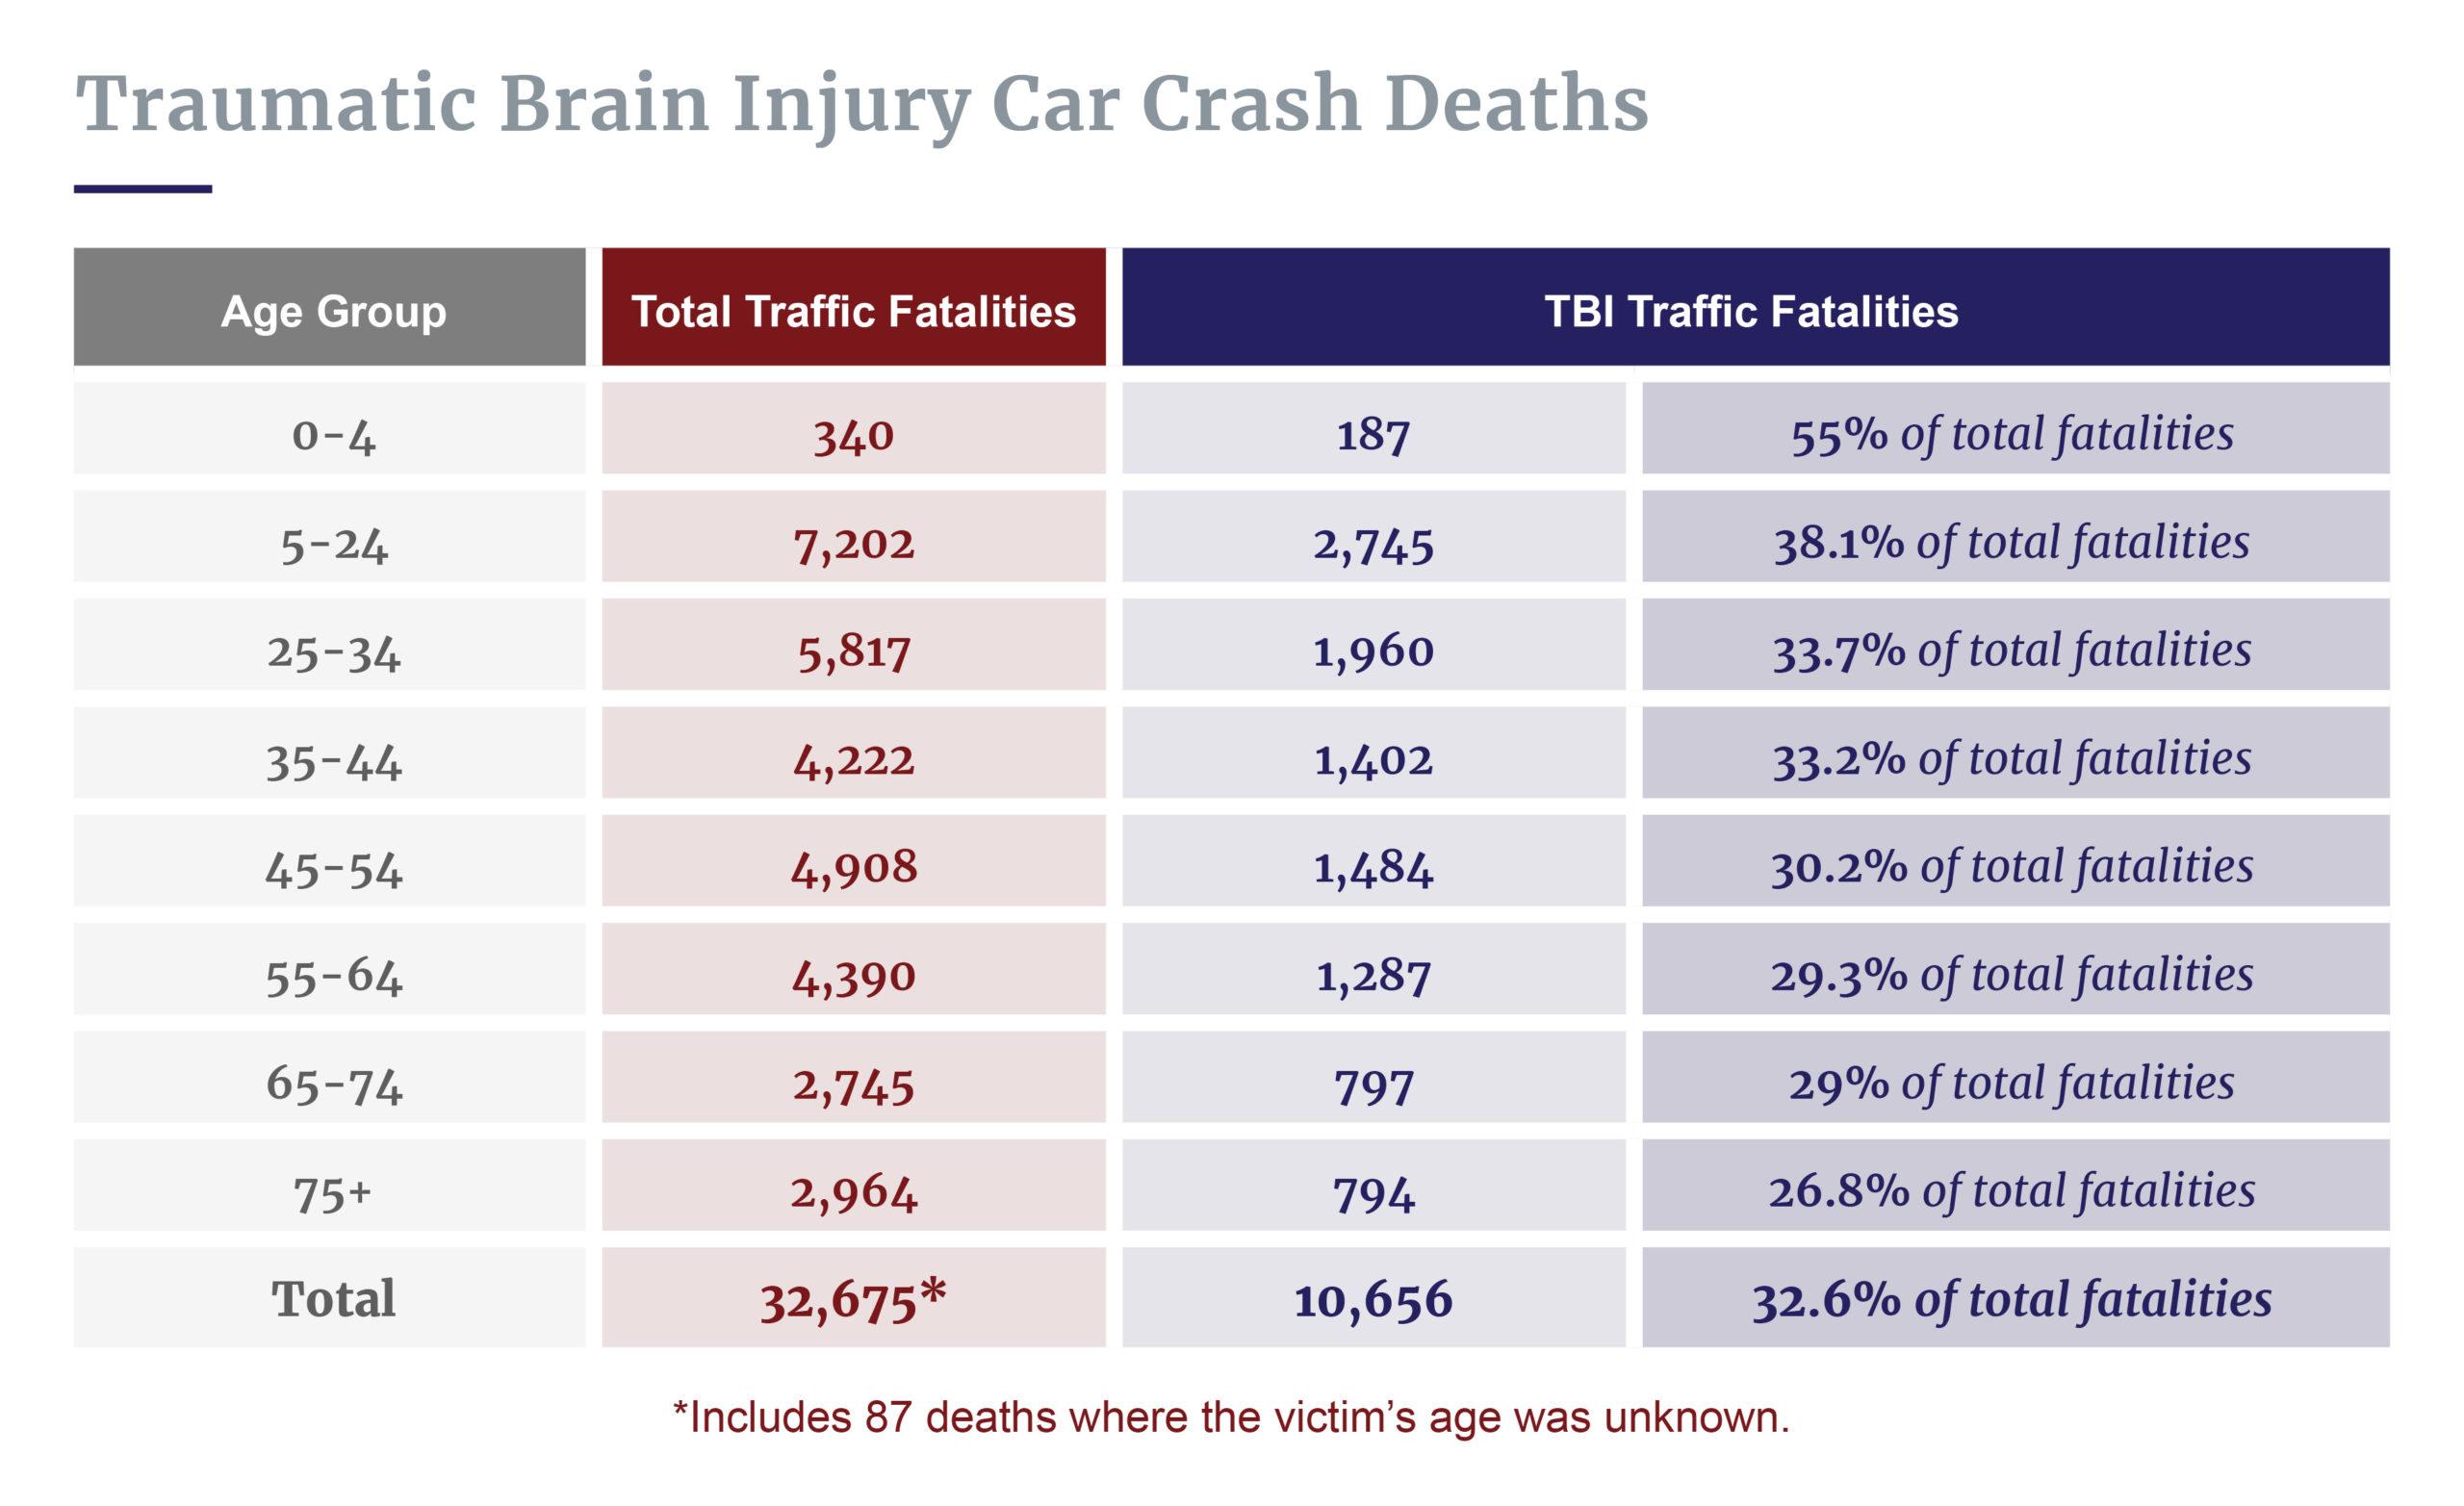 Age of TBI crash victims